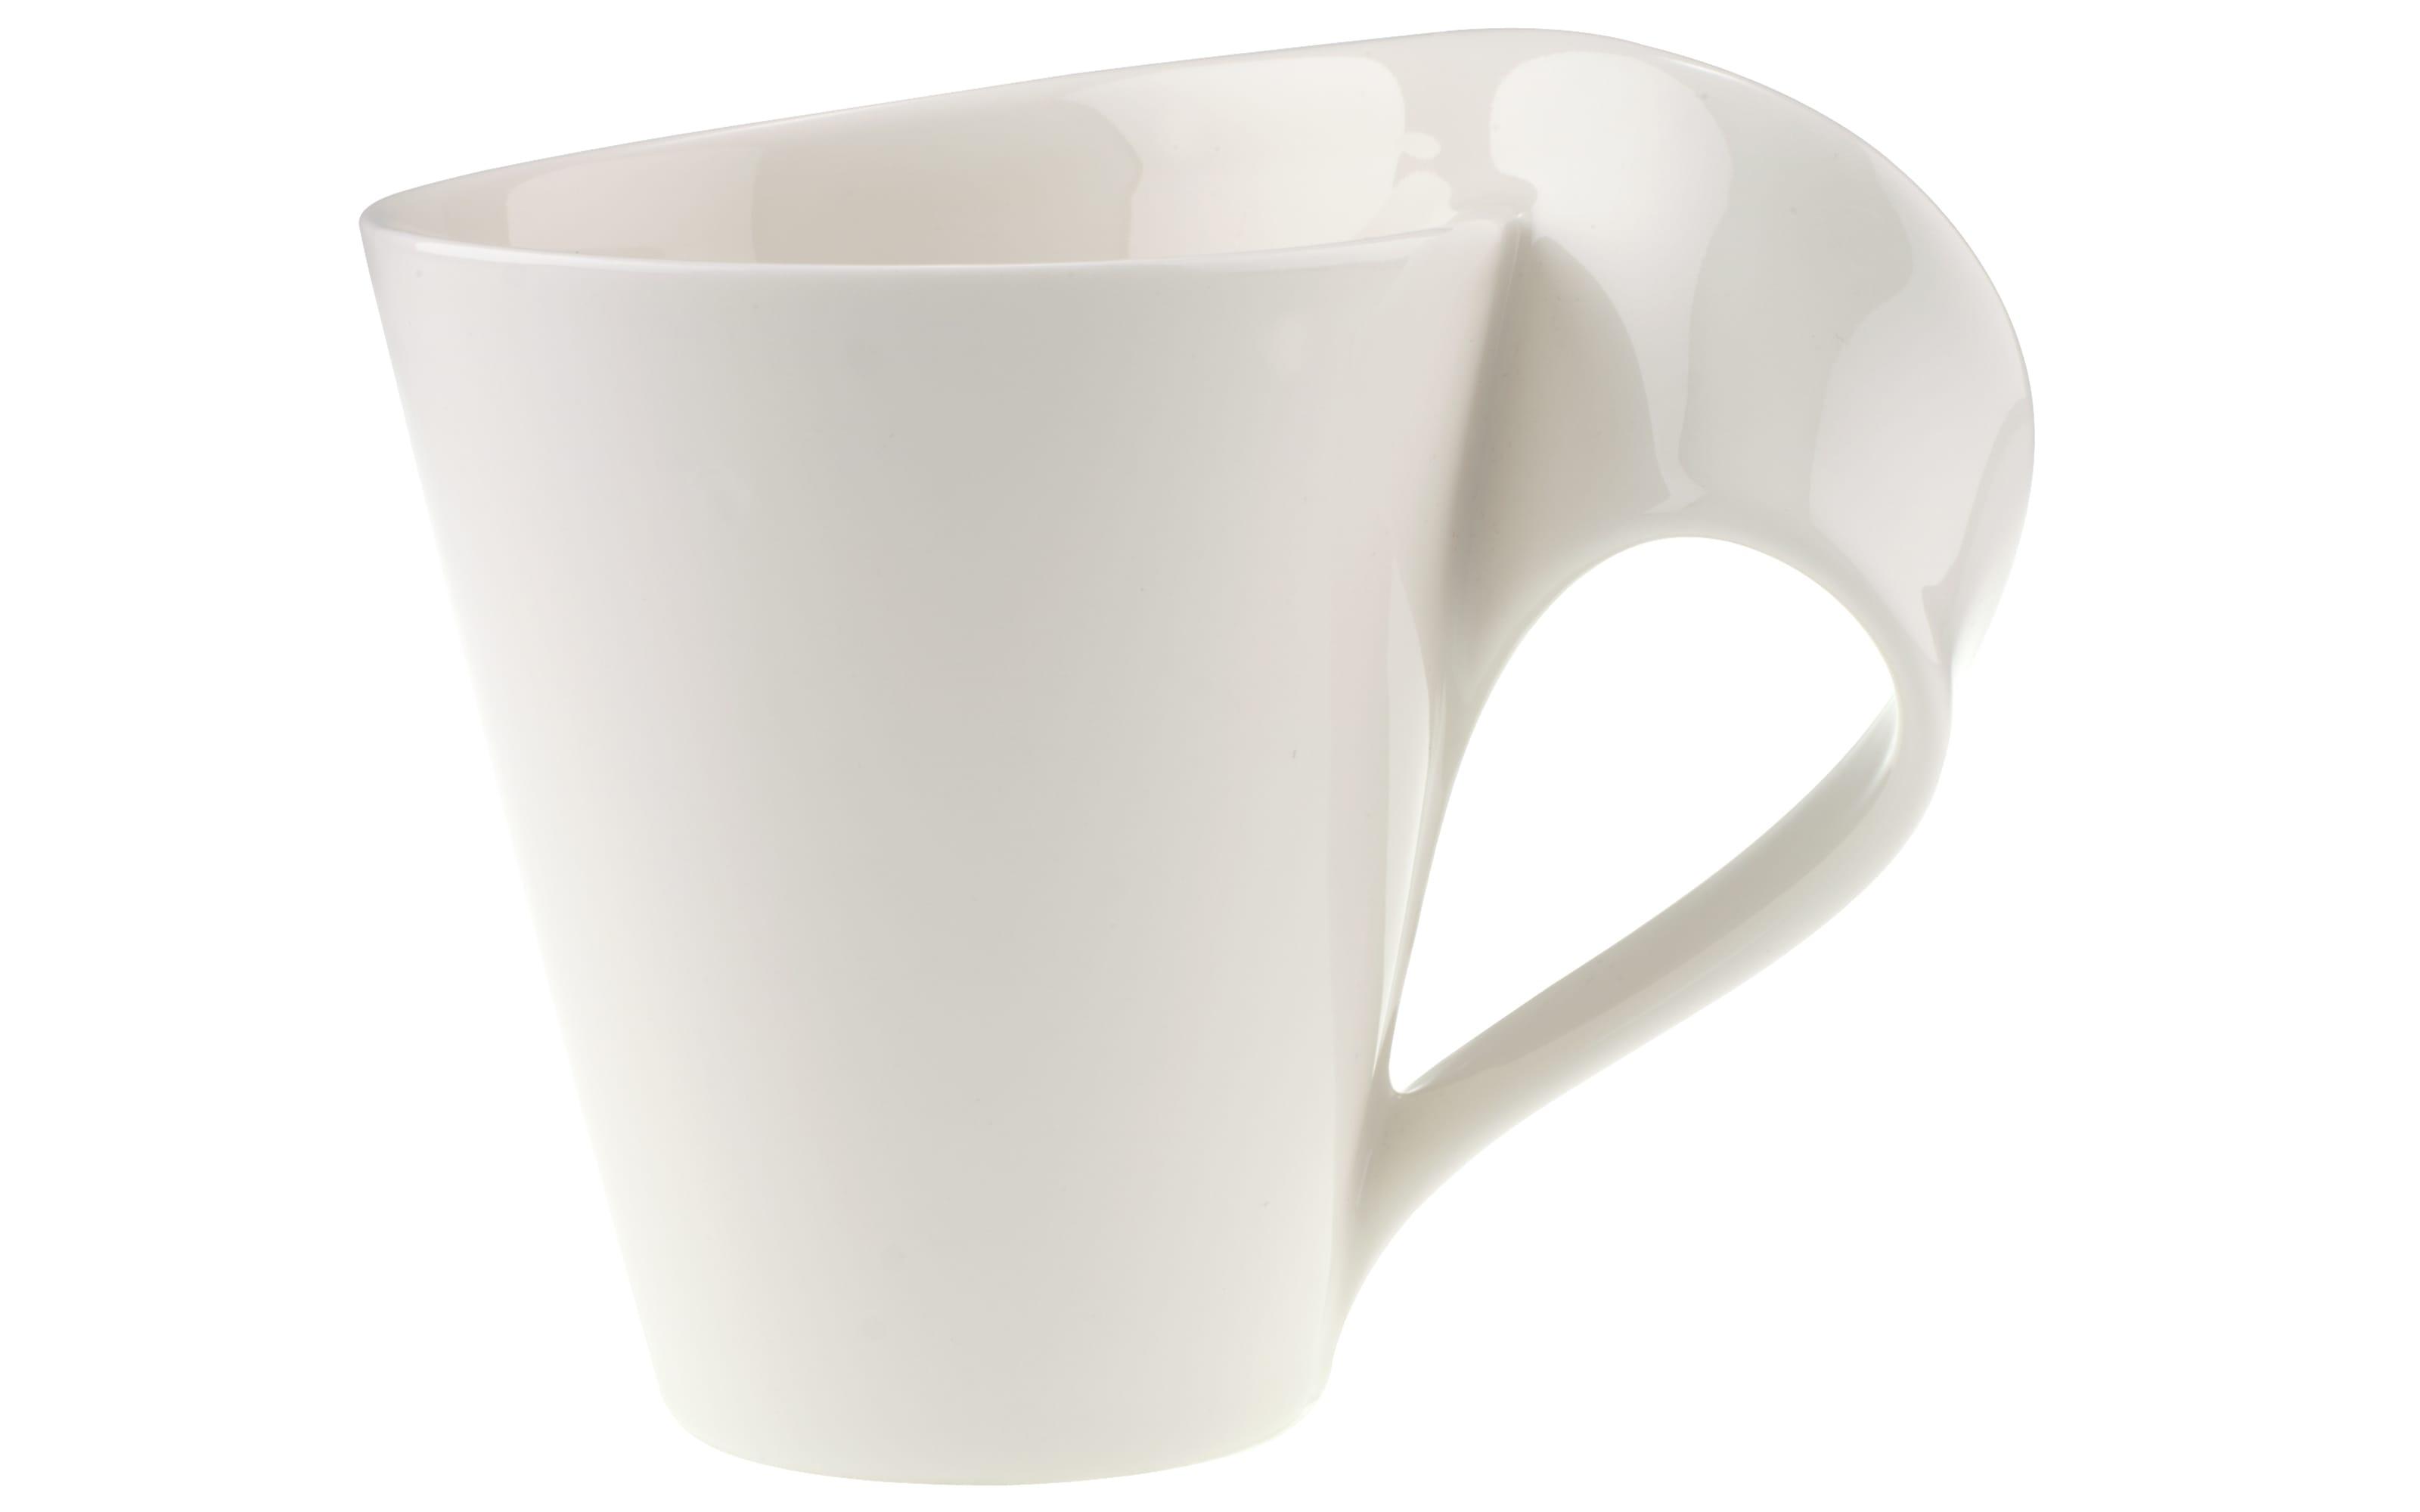 Becher New Wave Cafe in weiß, 0,35 l